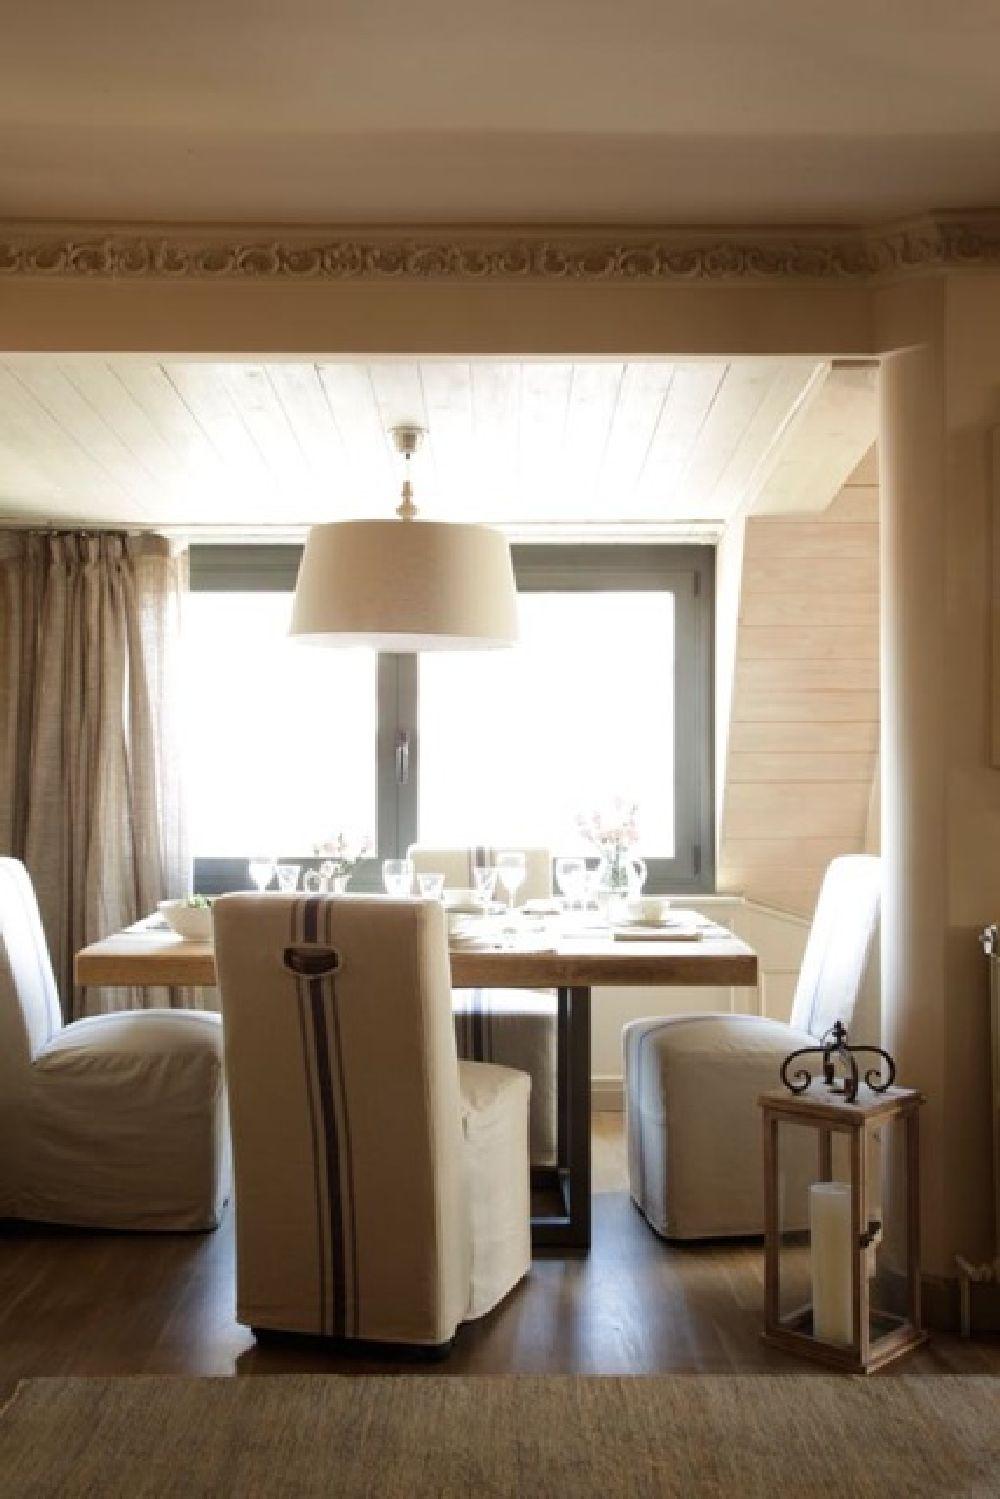 adelaparvu.com despre locuinta parter si mansarda in stil combinat clasic si rustic, designer Jeanette Tresing, Foto Jeanette Tresing (8)